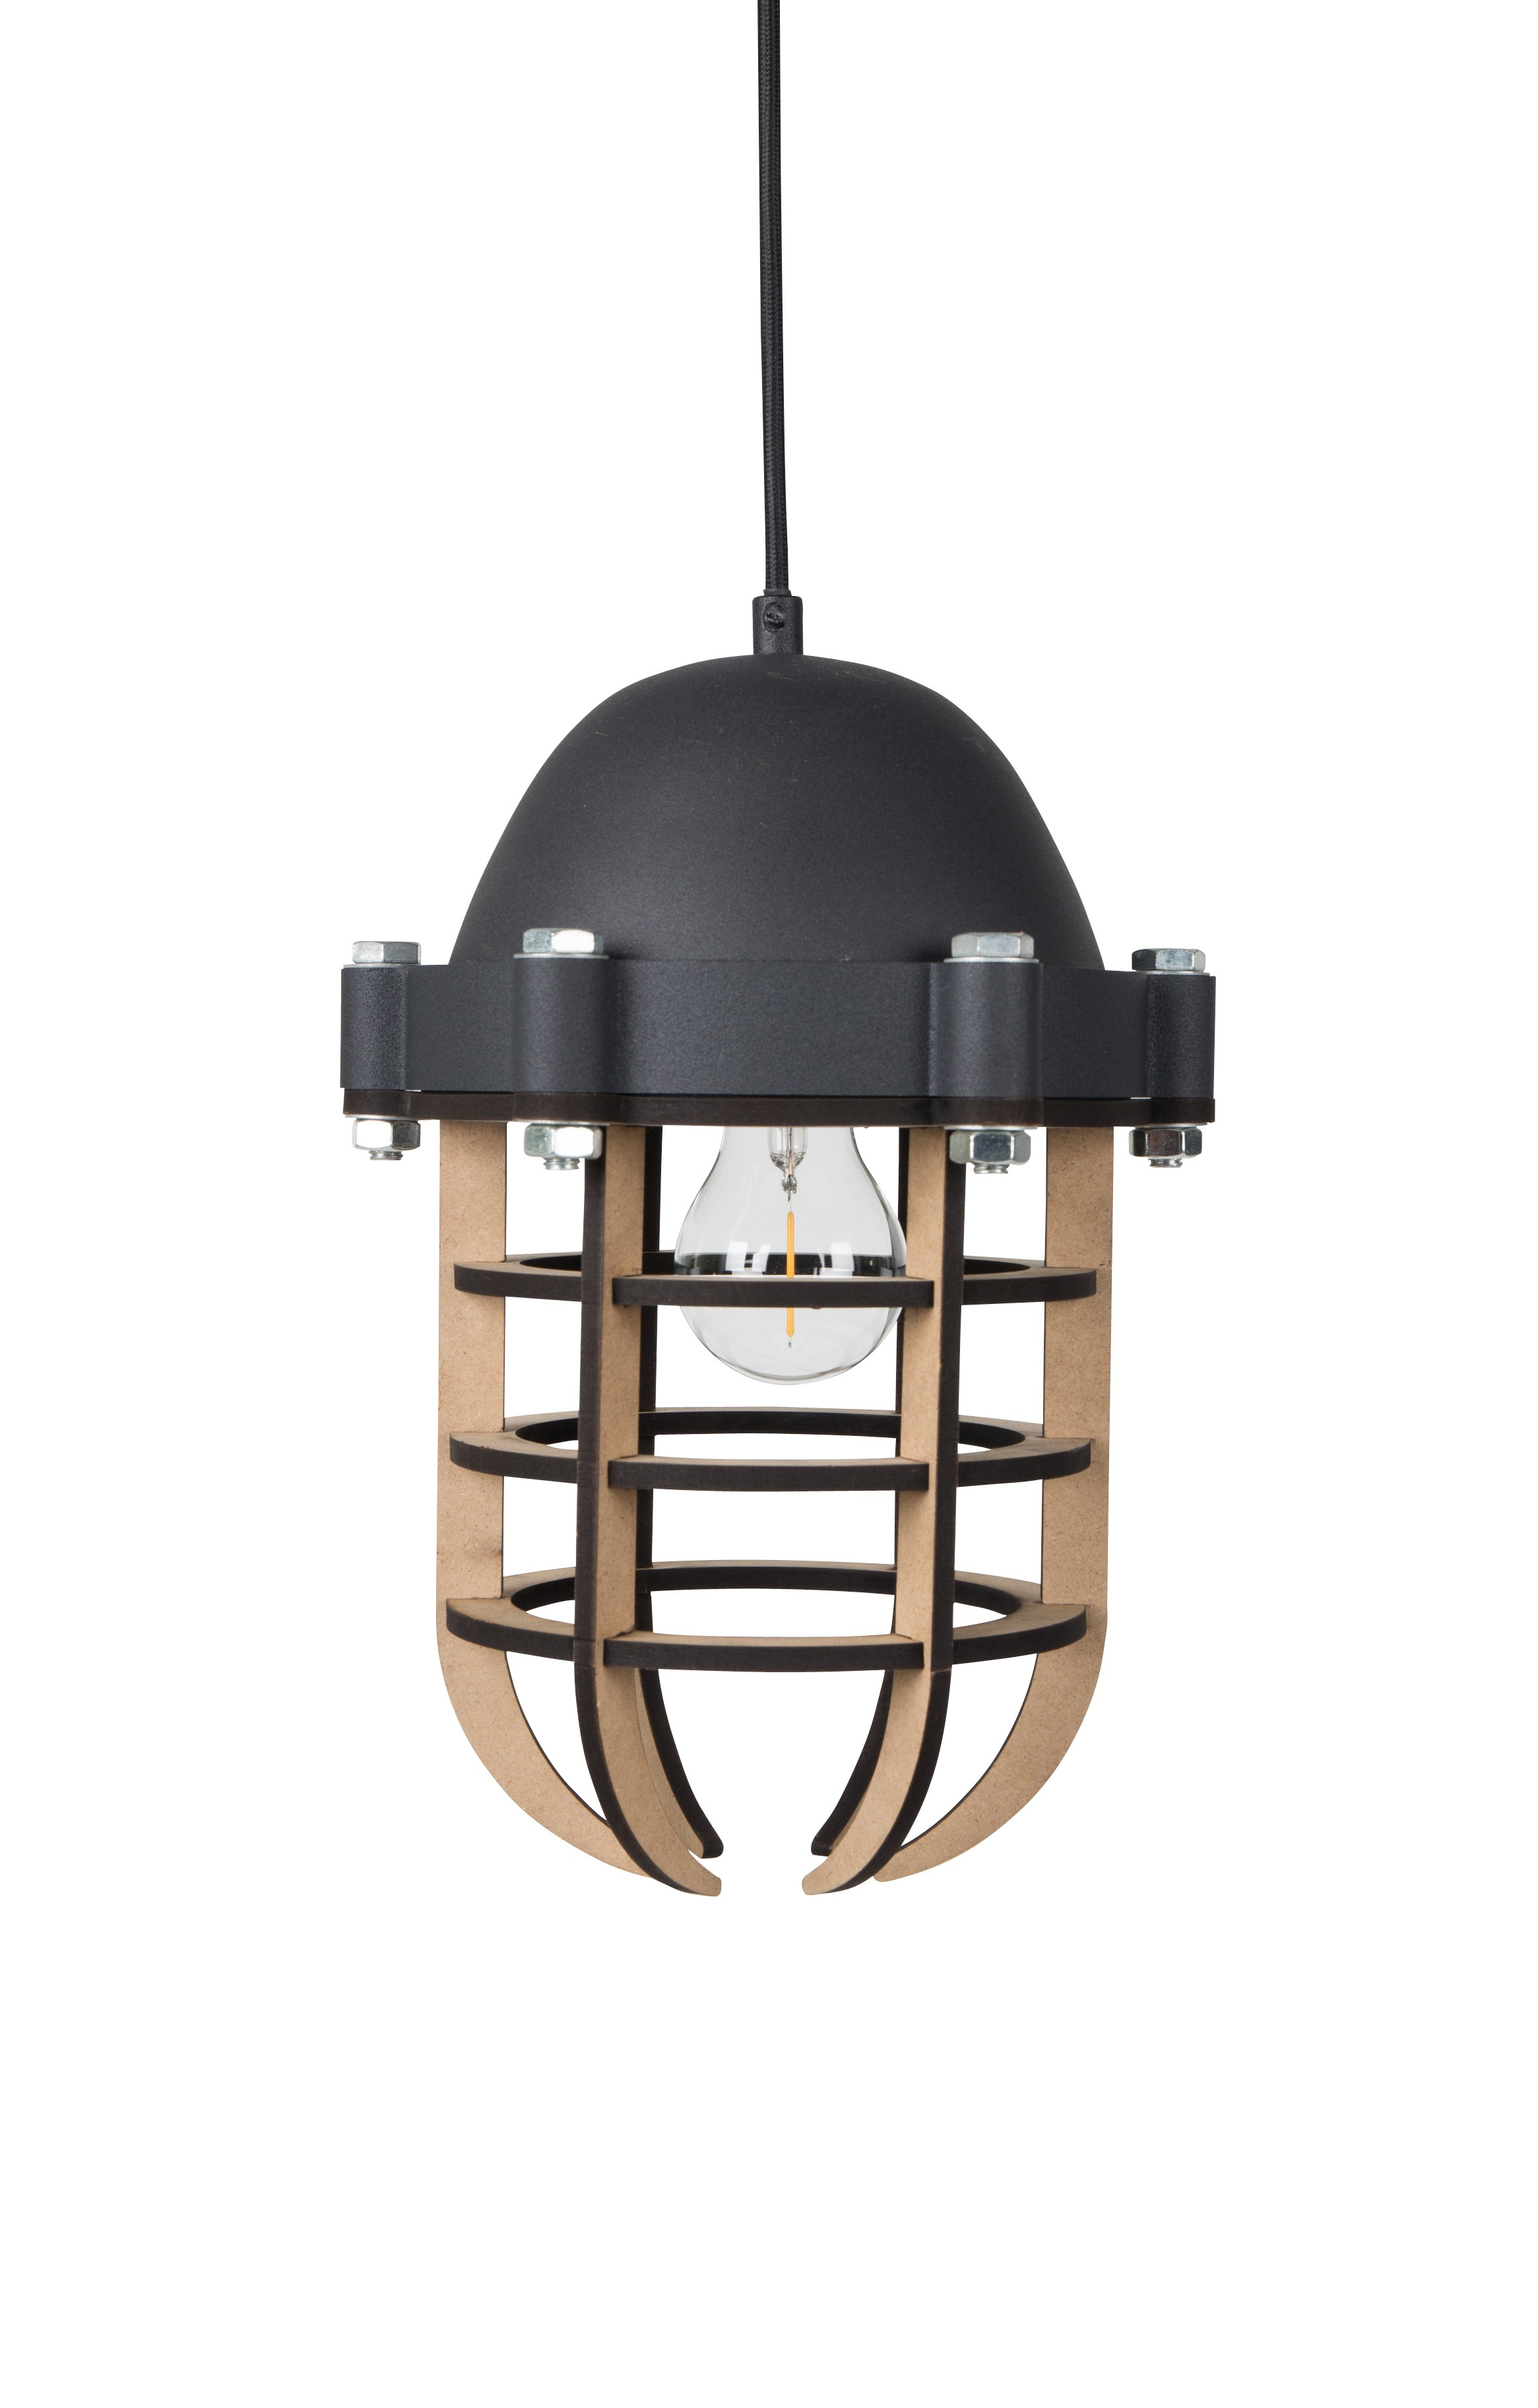 Zuiver hanglamp navigator zwart by olaf zuiver hanglamp navigator zwart by olaf deze trendy moderne lamp